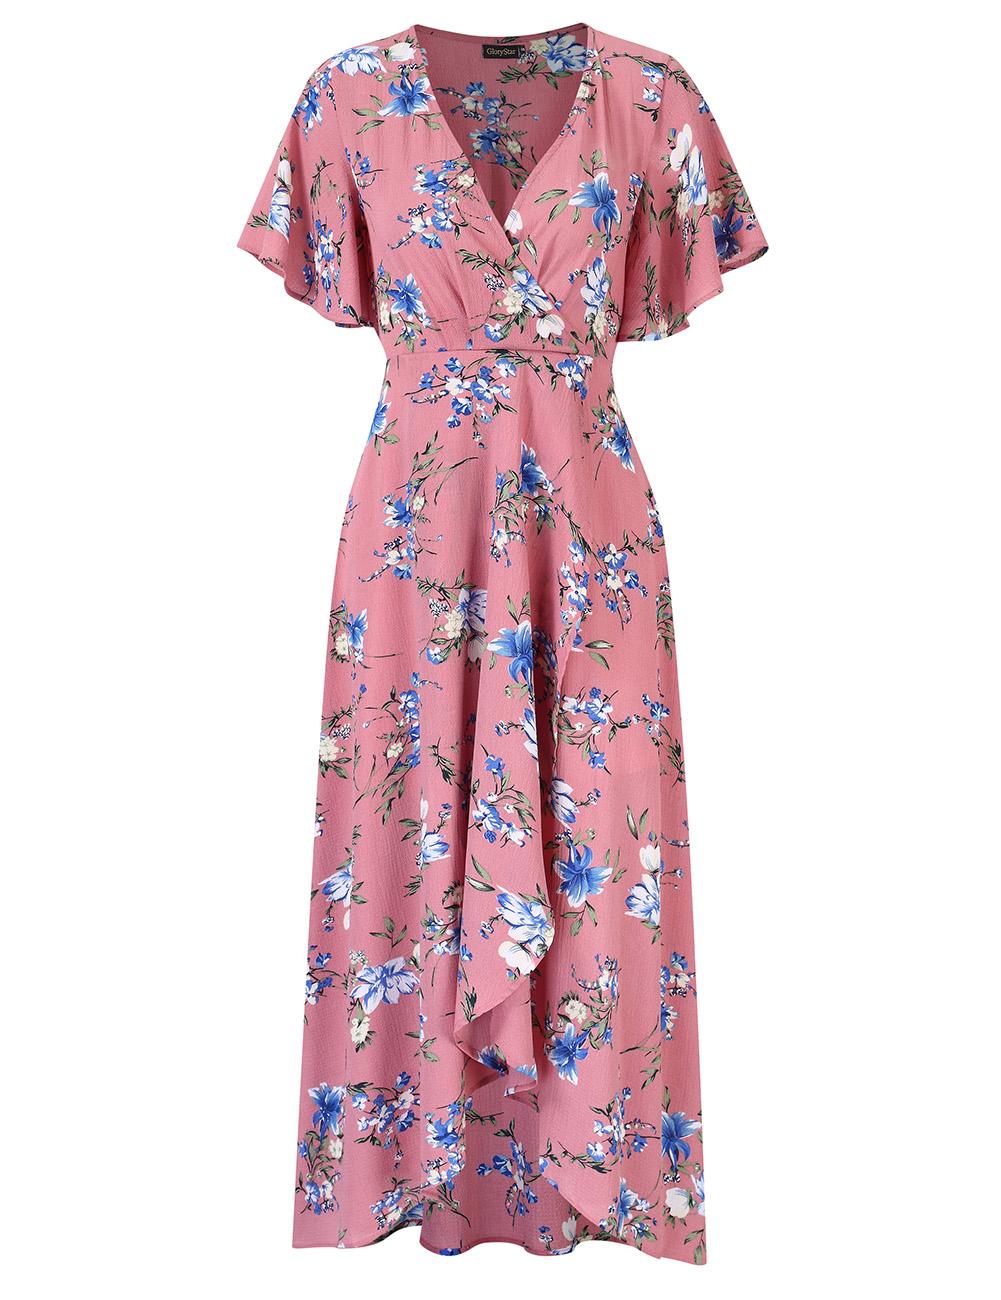 [US Direct] Women Chiffon Dress V-neck Floral Print Short Sleeve Middle Waist Split Maxi Dress